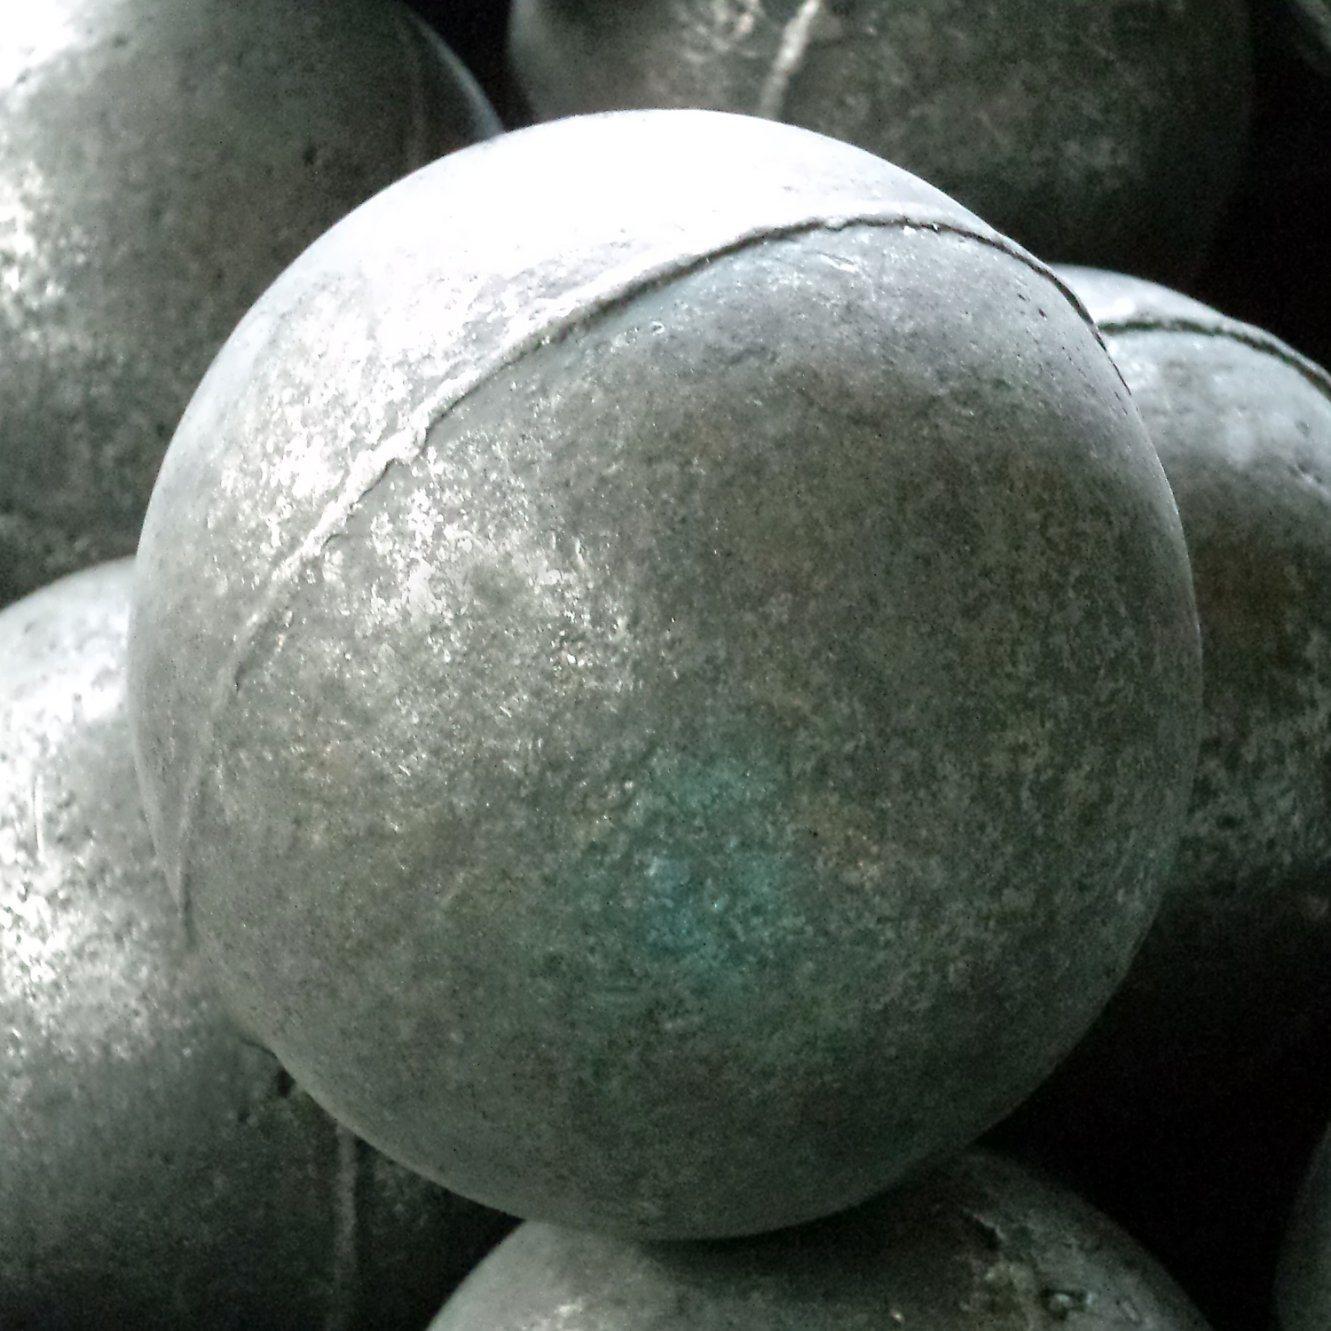 Casting iron balls